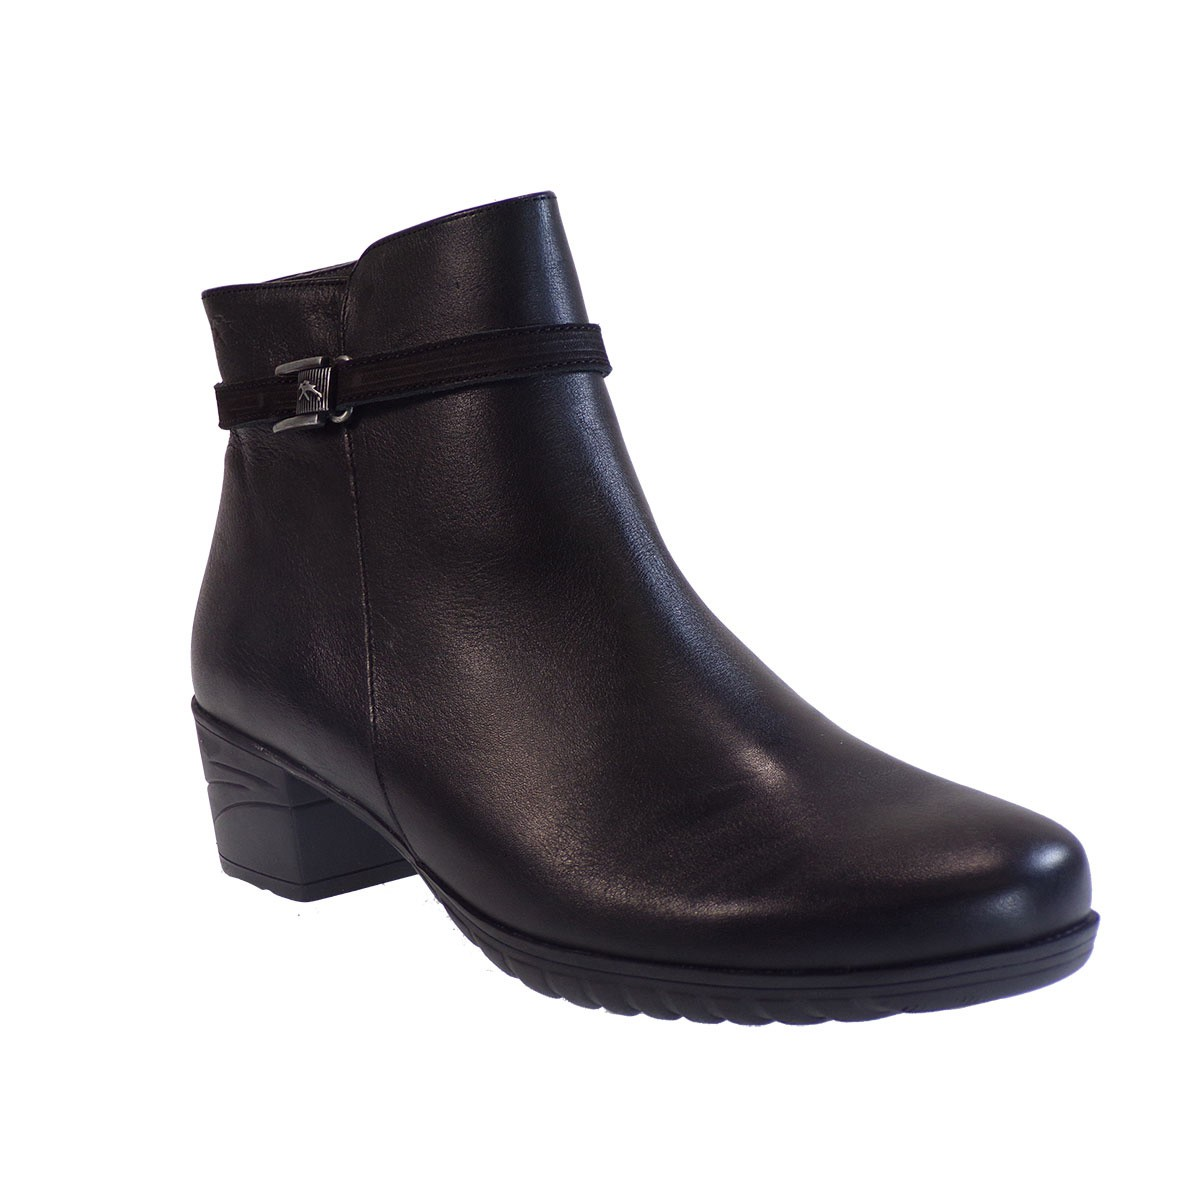 Fluchos Femme Γυναικεία Παπούτσια Μποτάκια F0588 CHARIS 34525 Μαύρο Δέρμα